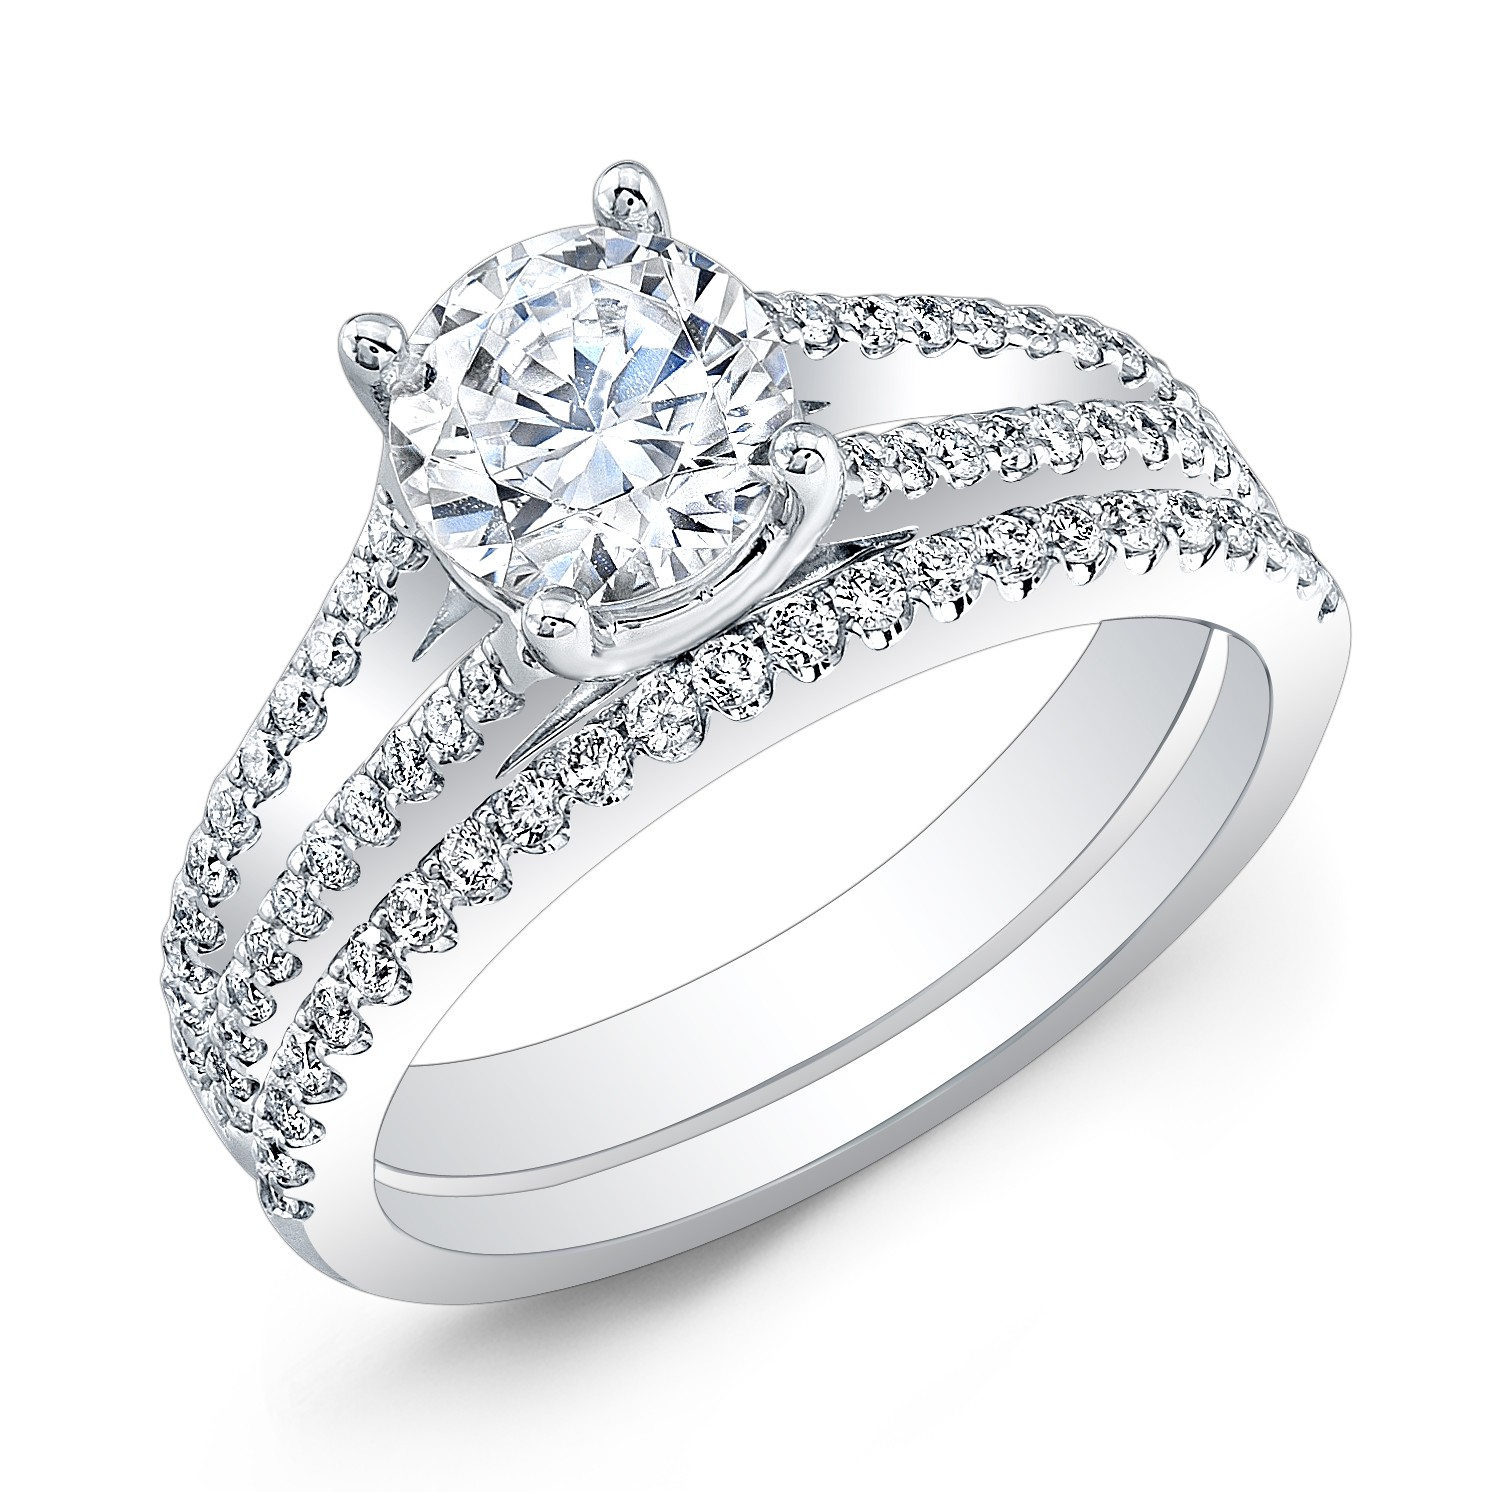 La s Diamond Bridal set Ring with 0 35 carat Round brilliant cut